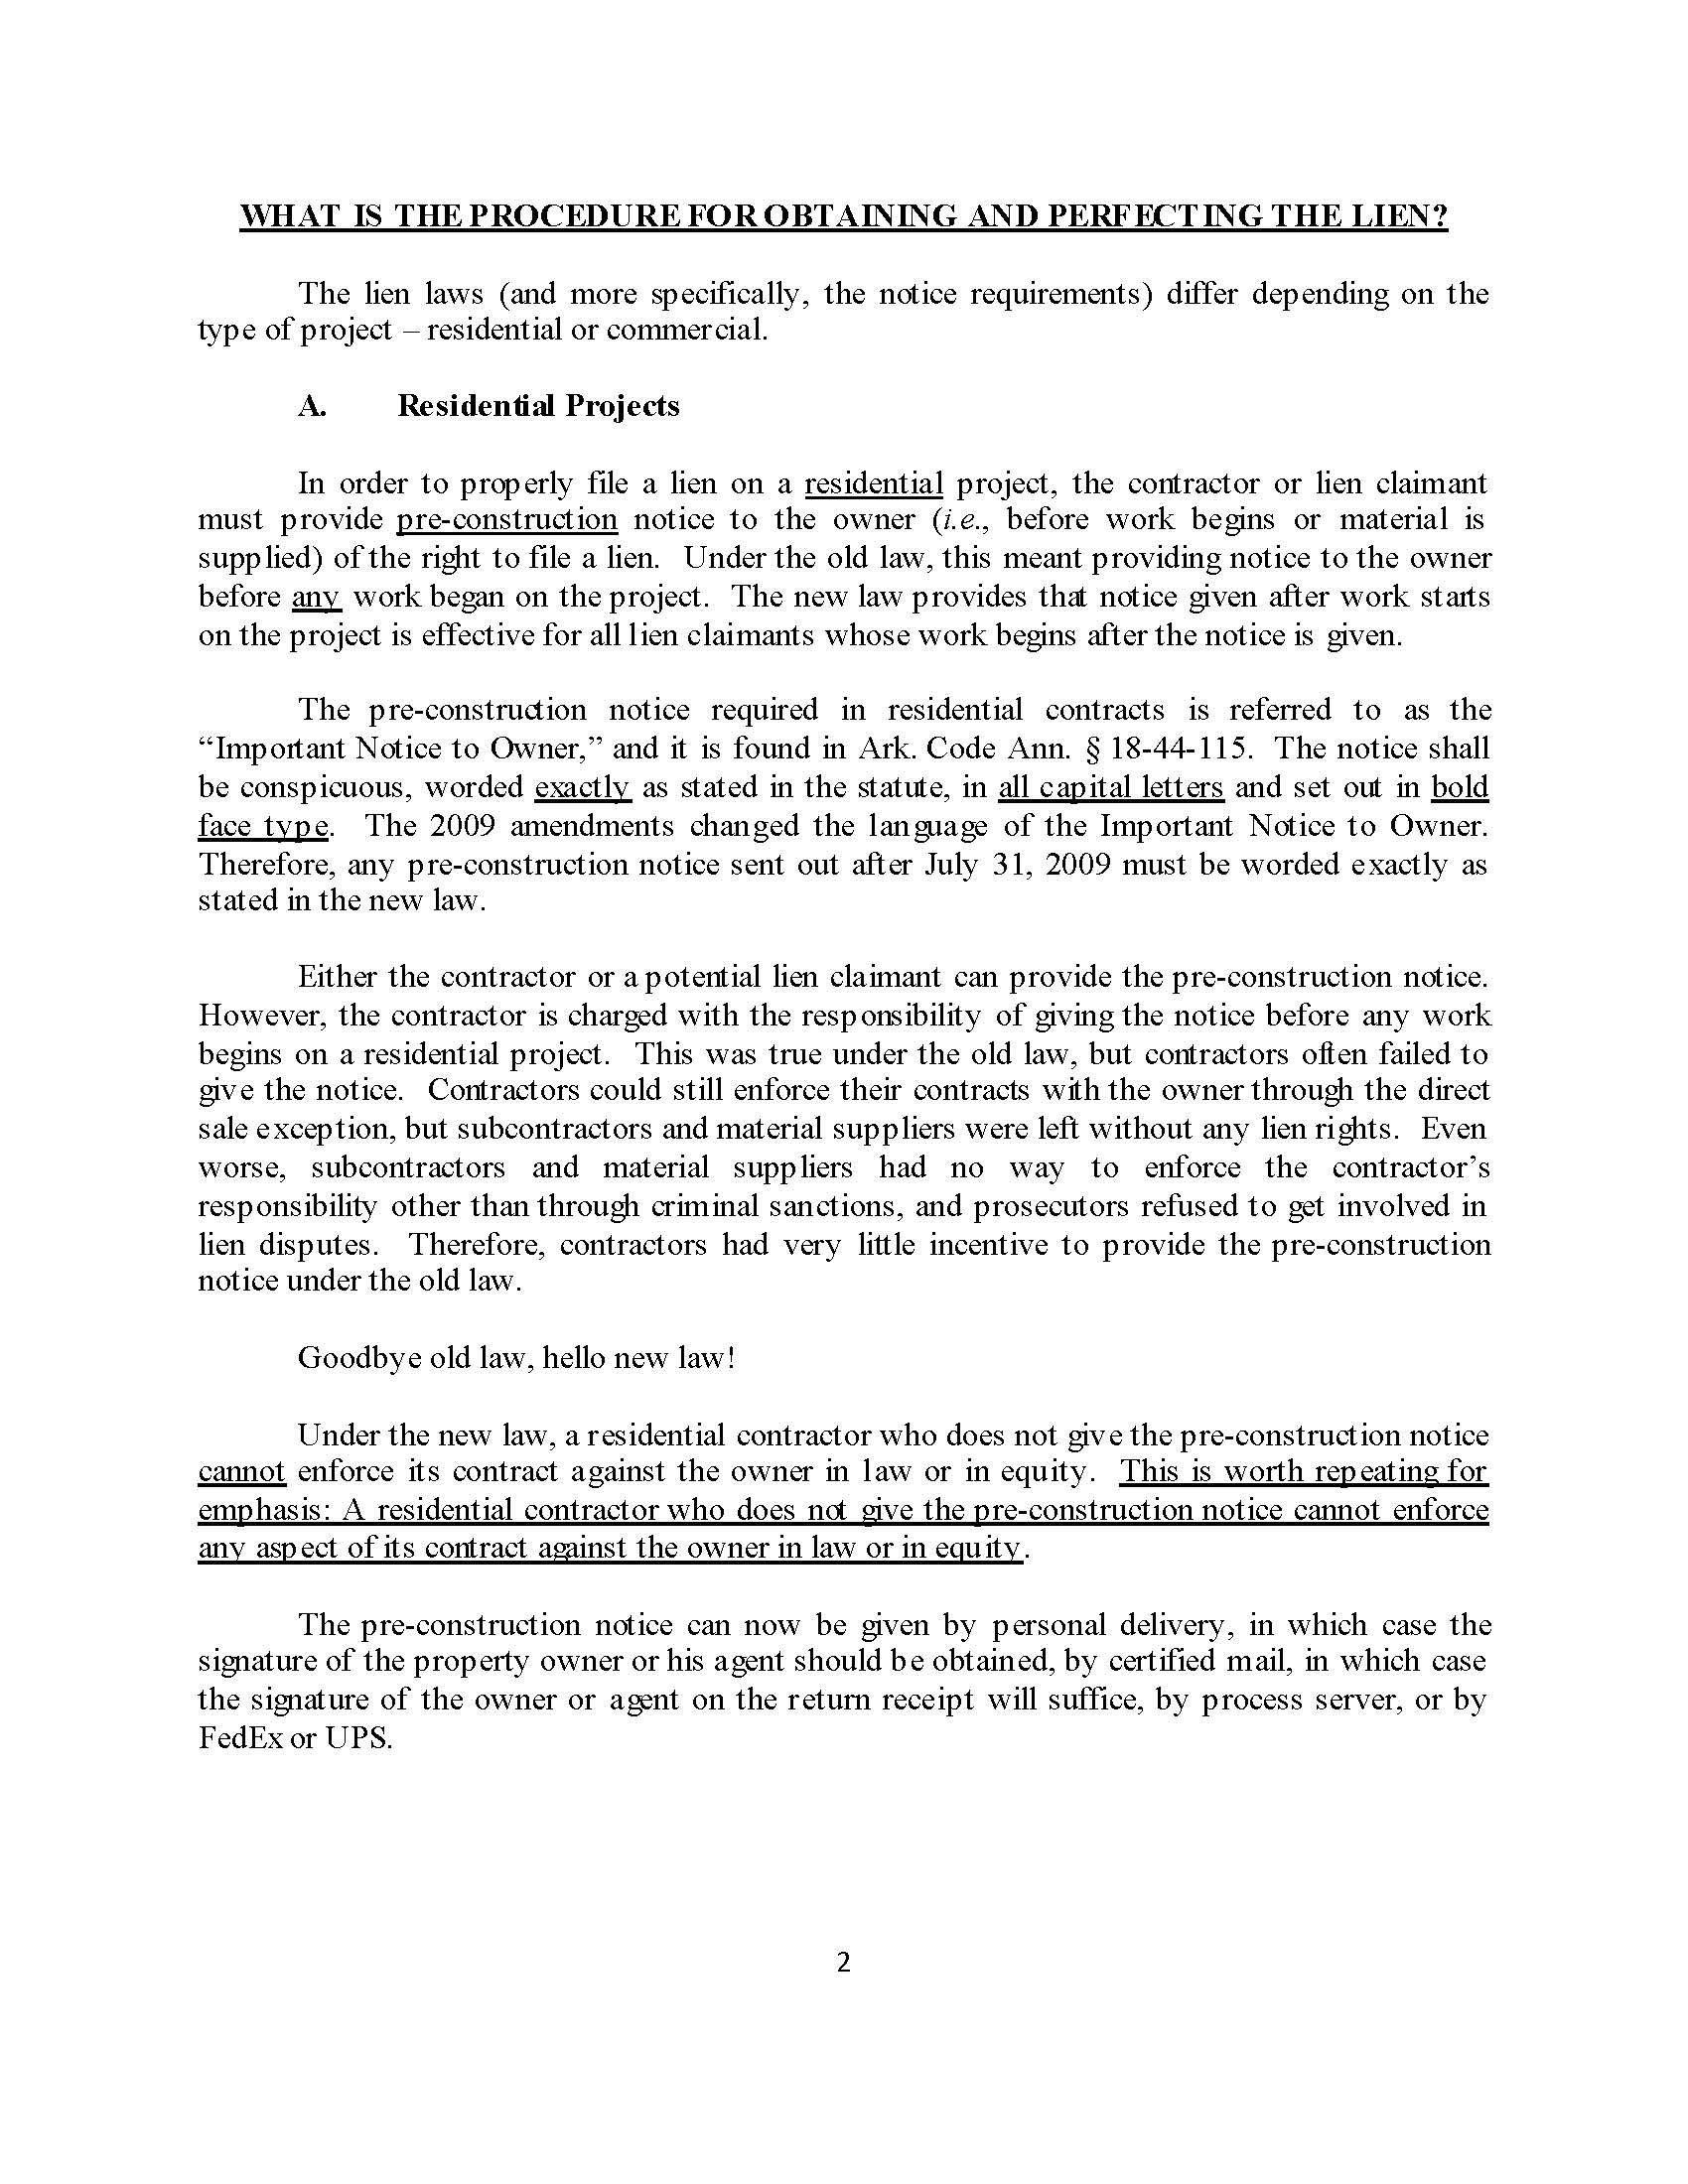 Summary-Materialman-Lien-Statutes-and-Amendments-faulkner-2011_Page_2.jpg